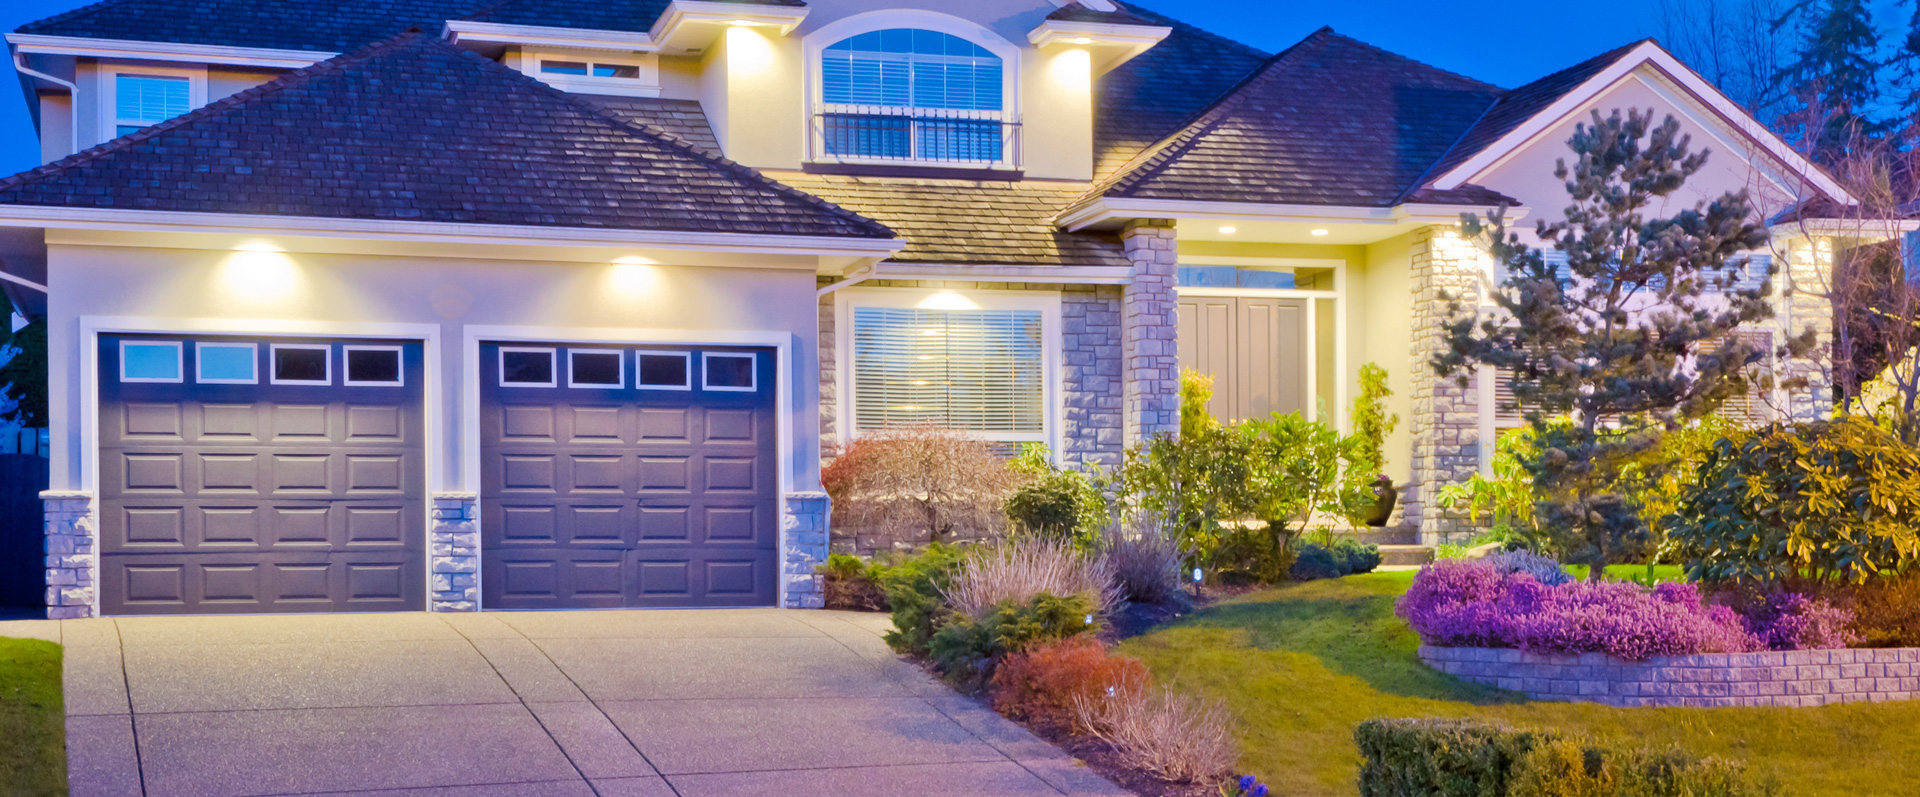 Beau Free Estimates On New Door Installations